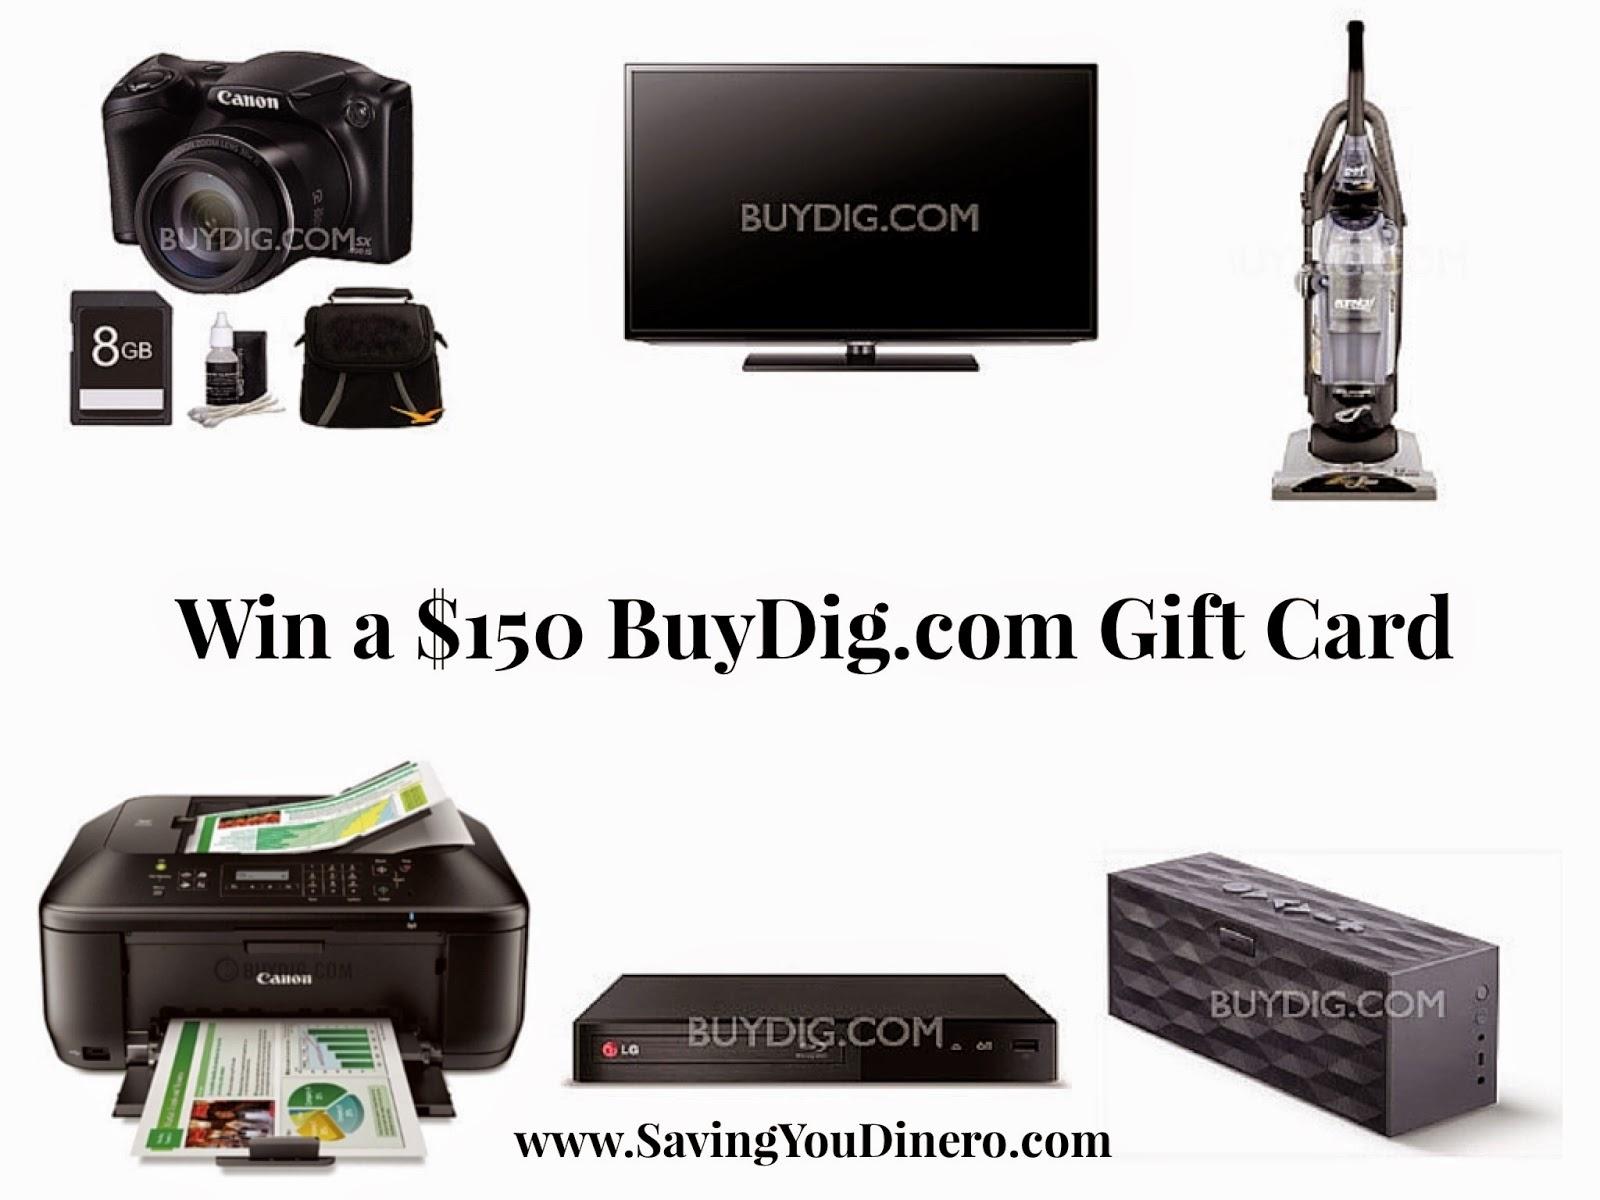 Enter the BuyDig.com Gift Card Giveaway. Ends 2/16